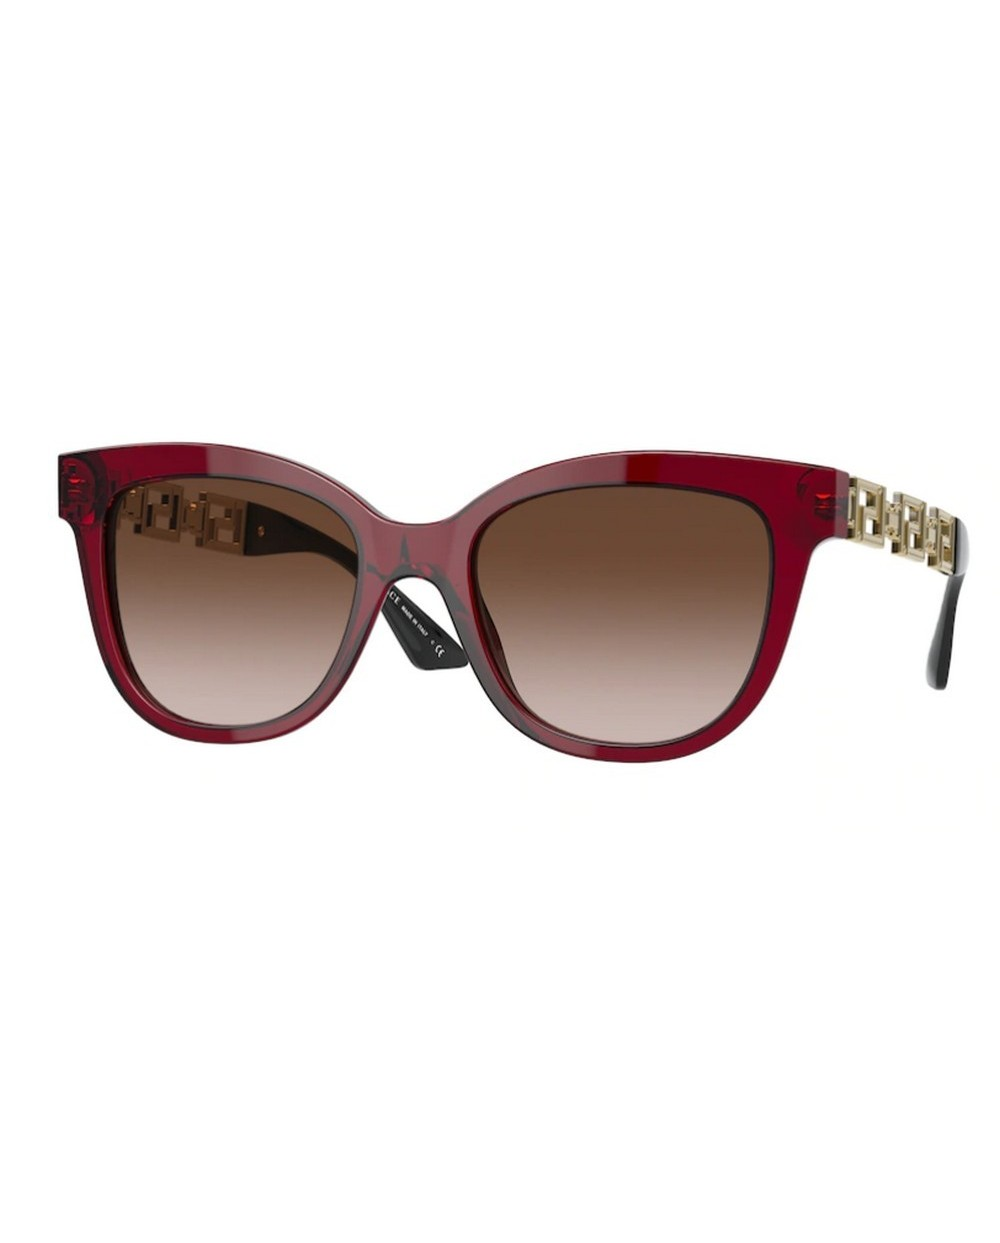 Occhiale da sole Versace VE 4394 originale garanzia italia